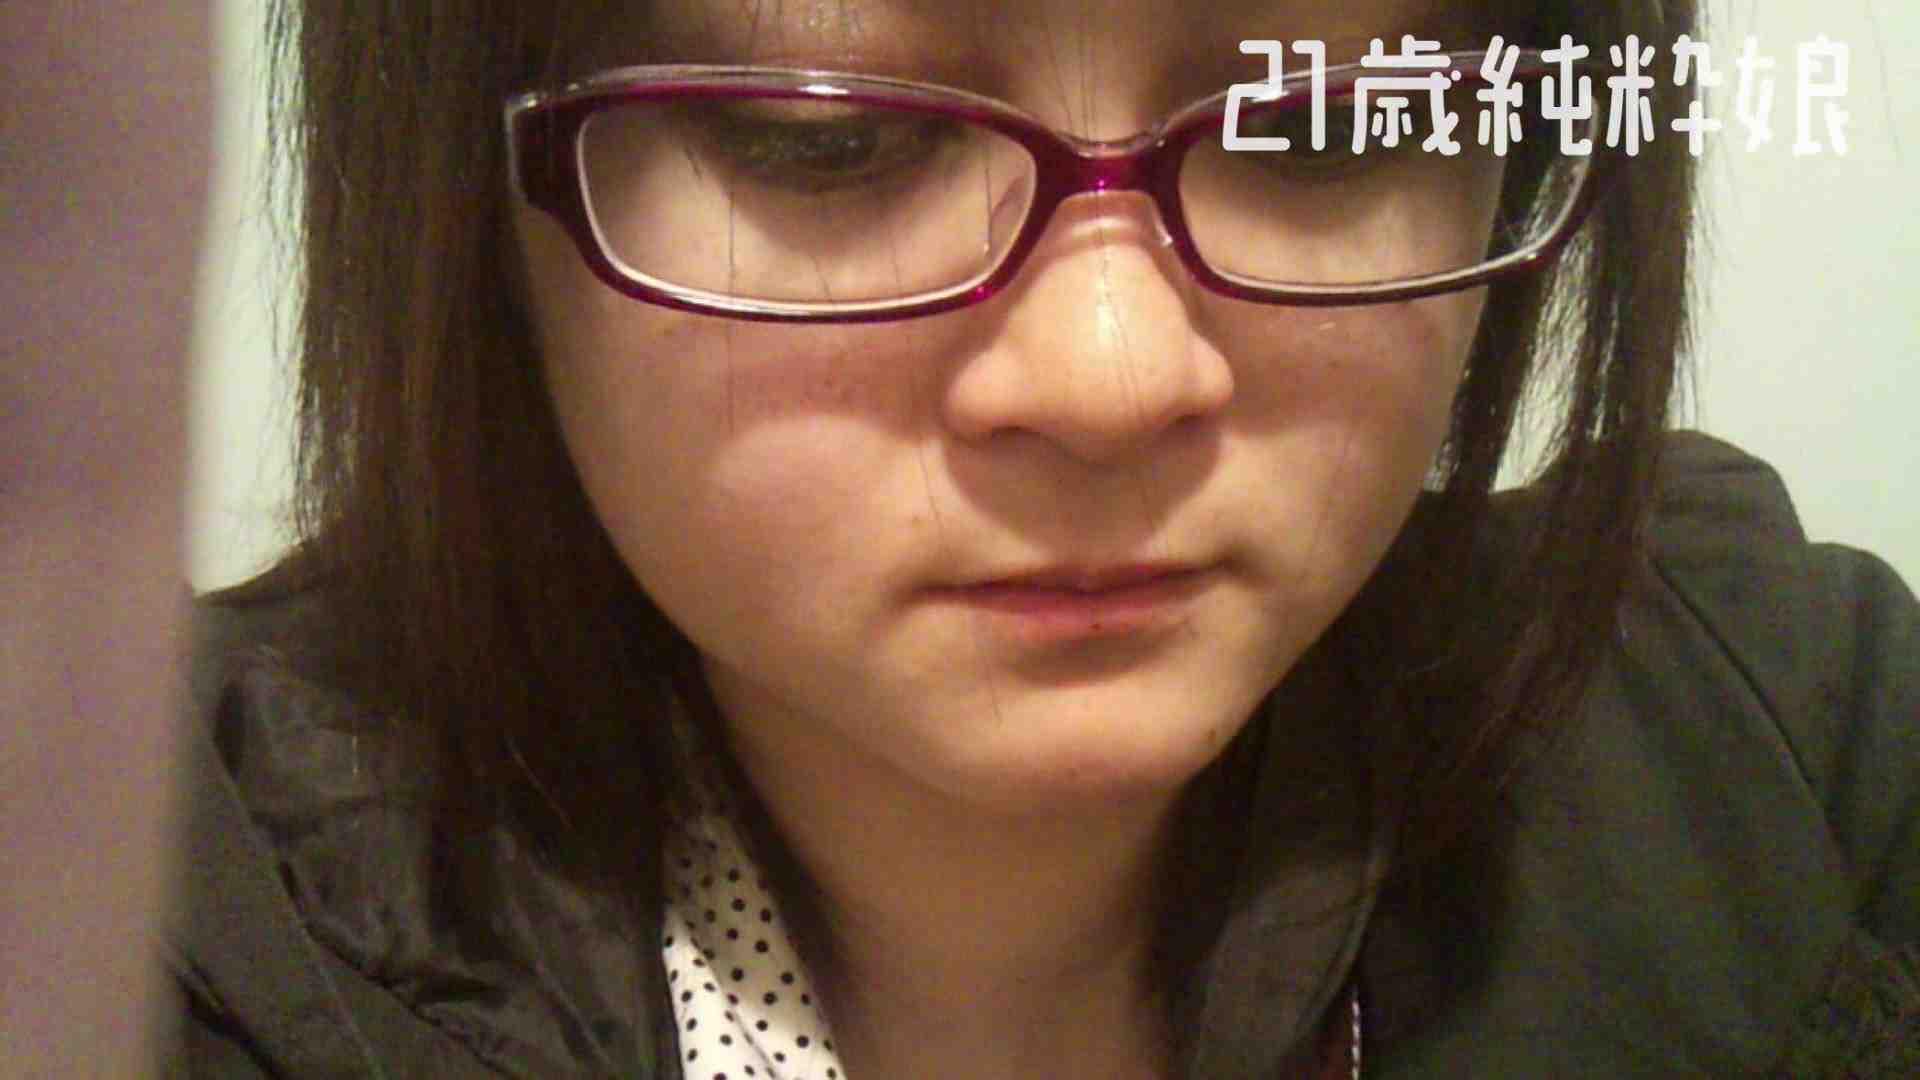 Gカップ21歳純粋嬢第2弾Vol.5 美女OL | 学校内で  78連発 67